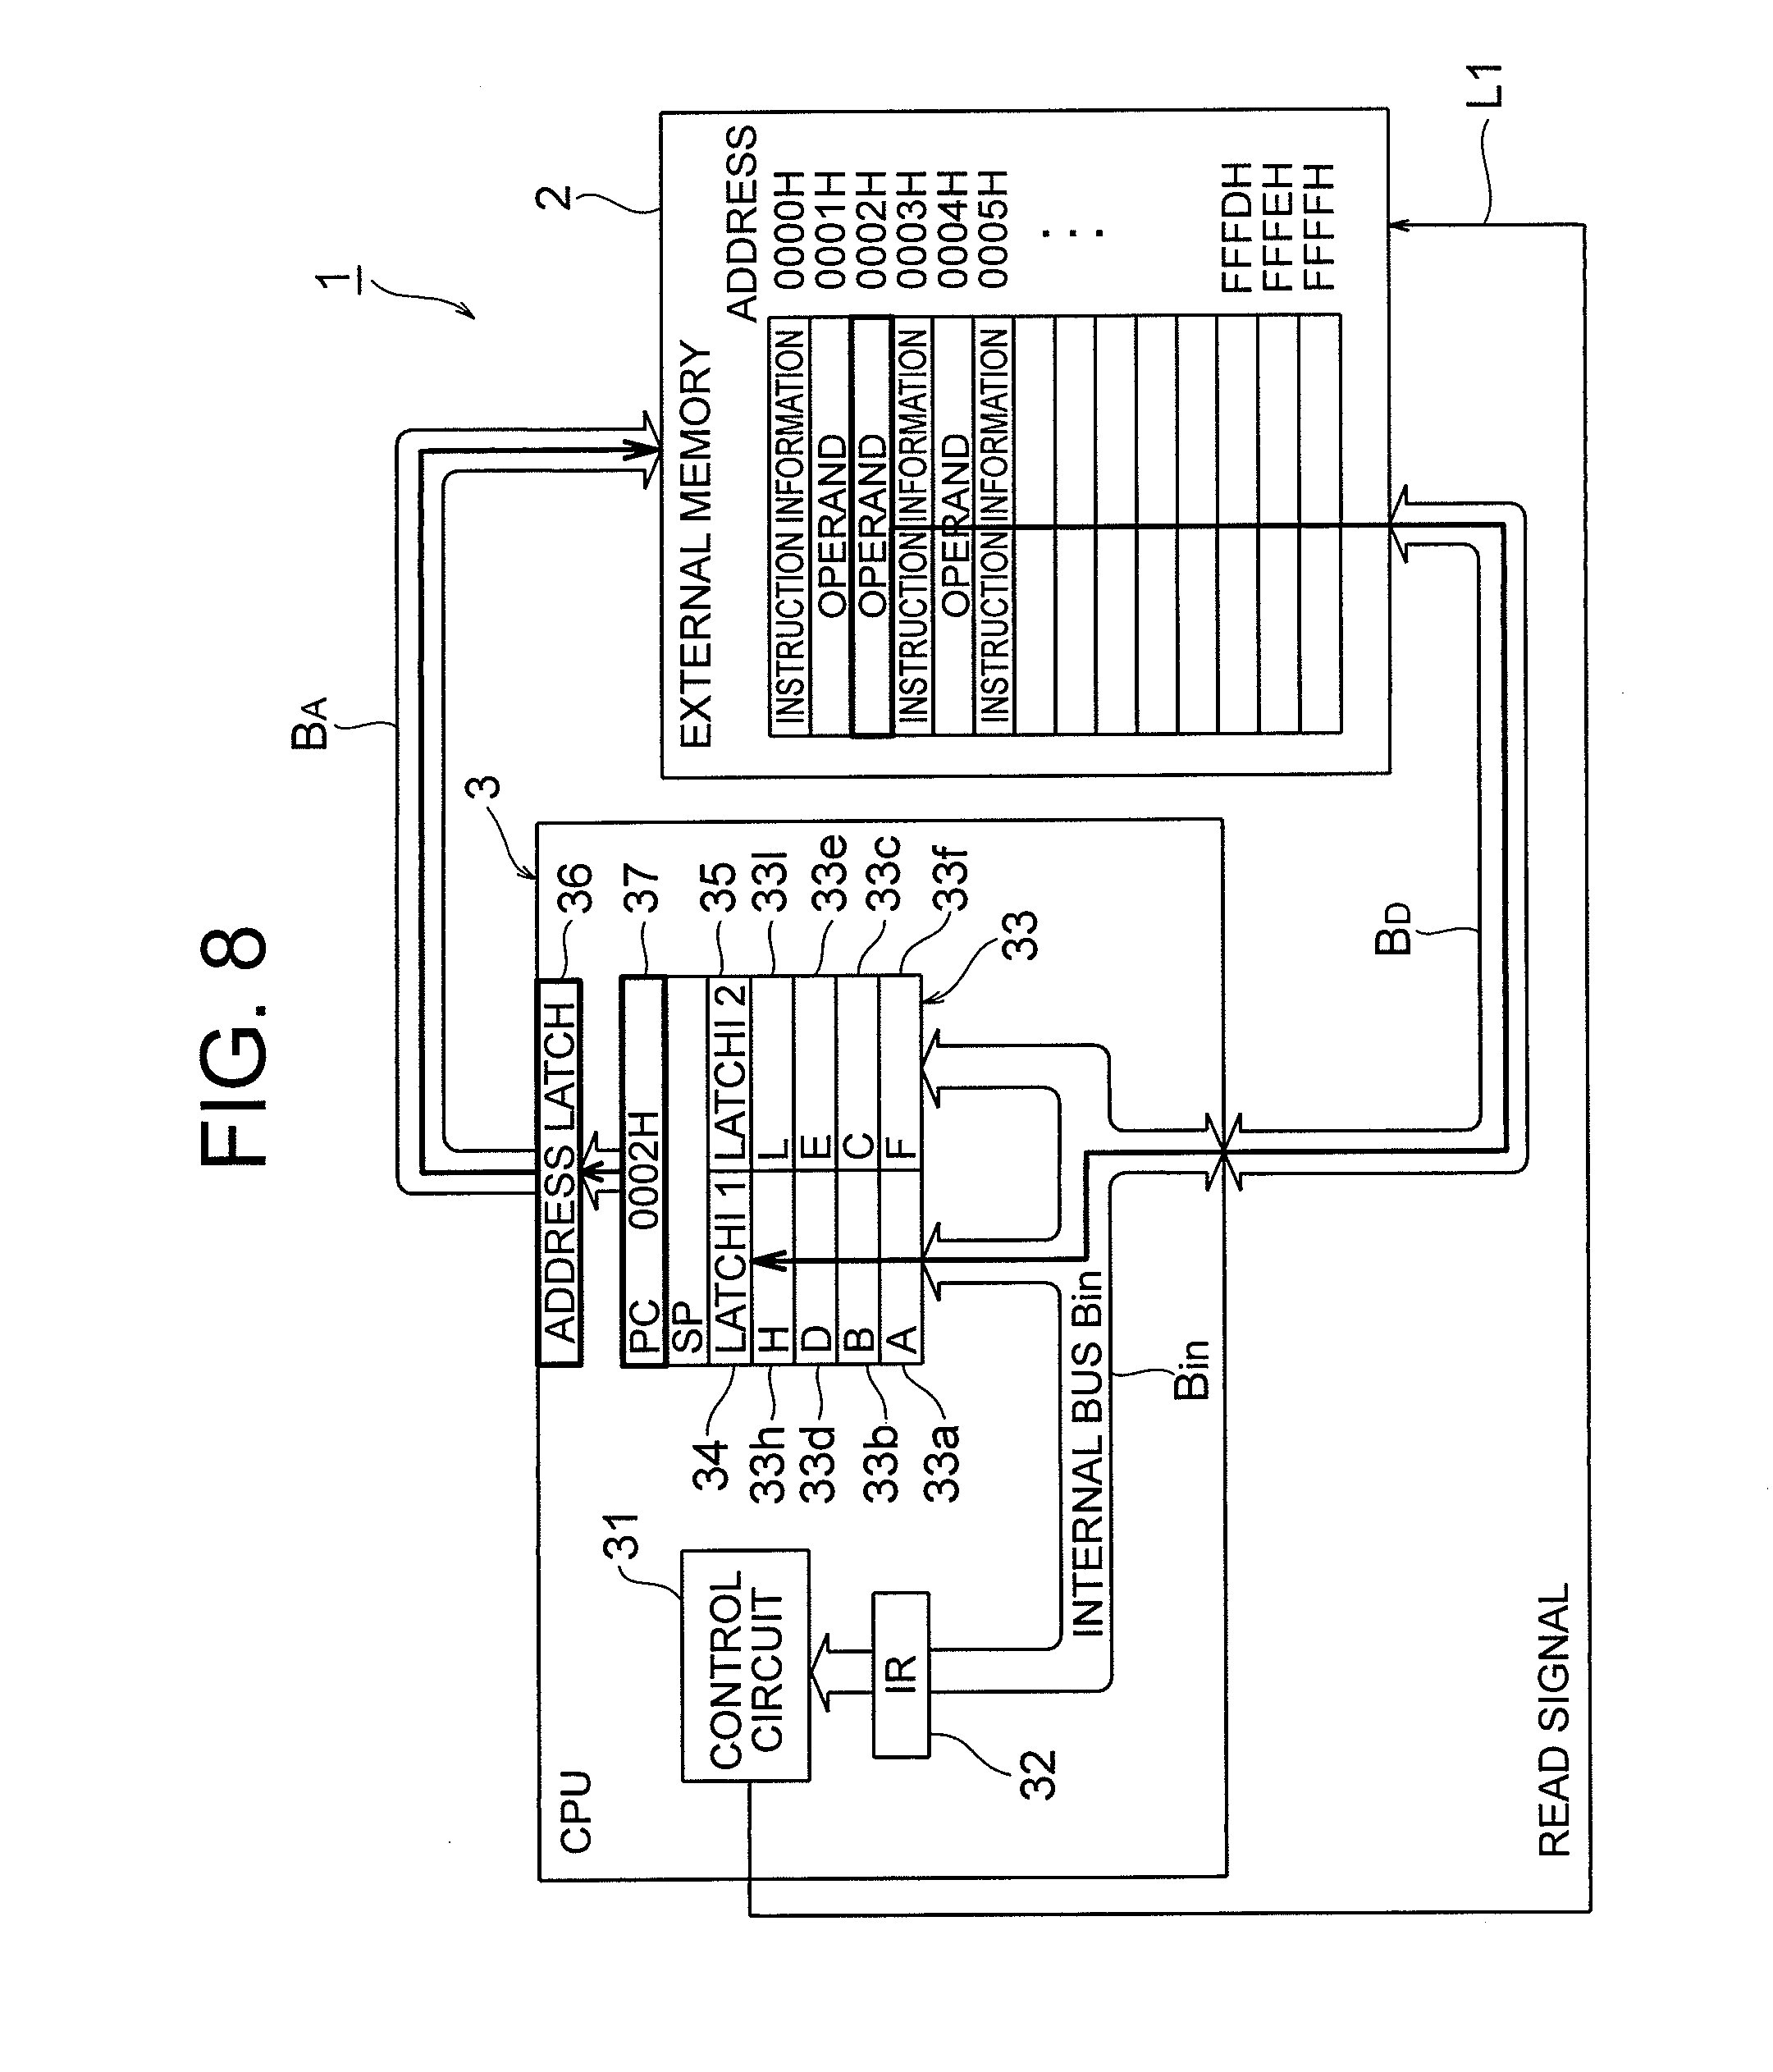 operand cpu diagram   19 wiring diagram images